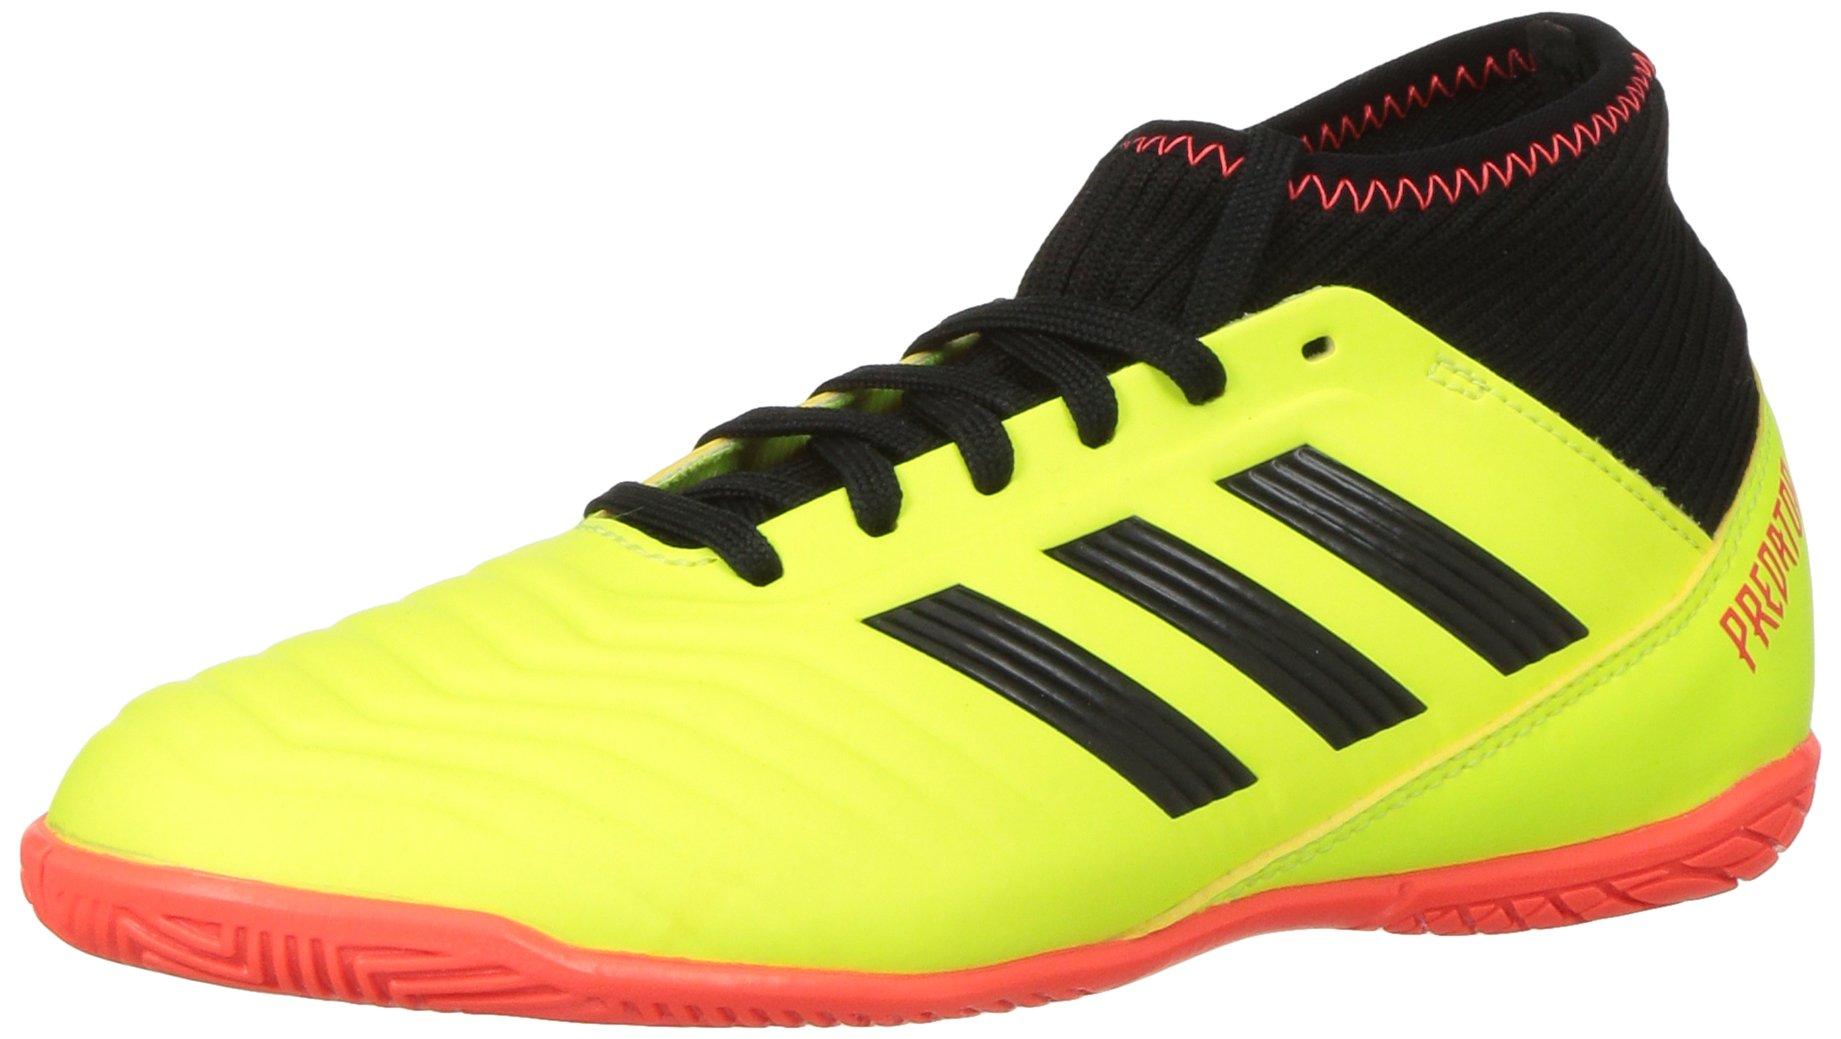 adidas Unisex-Kids Predator Tango 18.3 Indoor Soccer Shoe, Solar Yellow/Black/Solar Red, 6 M US Big Kid